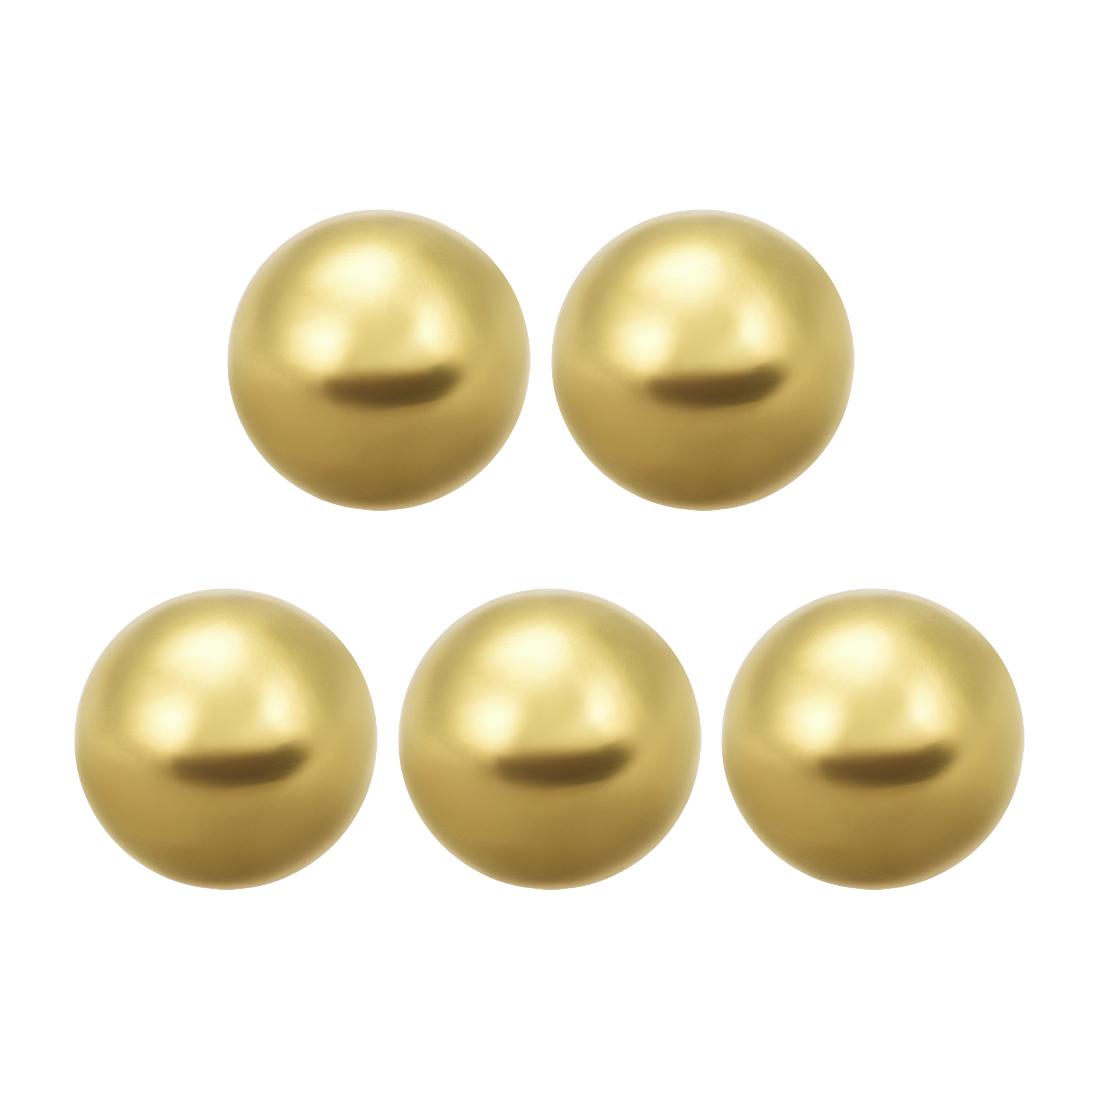 1/2-inch Precision Solid Brass Bearing Balls 5pcs